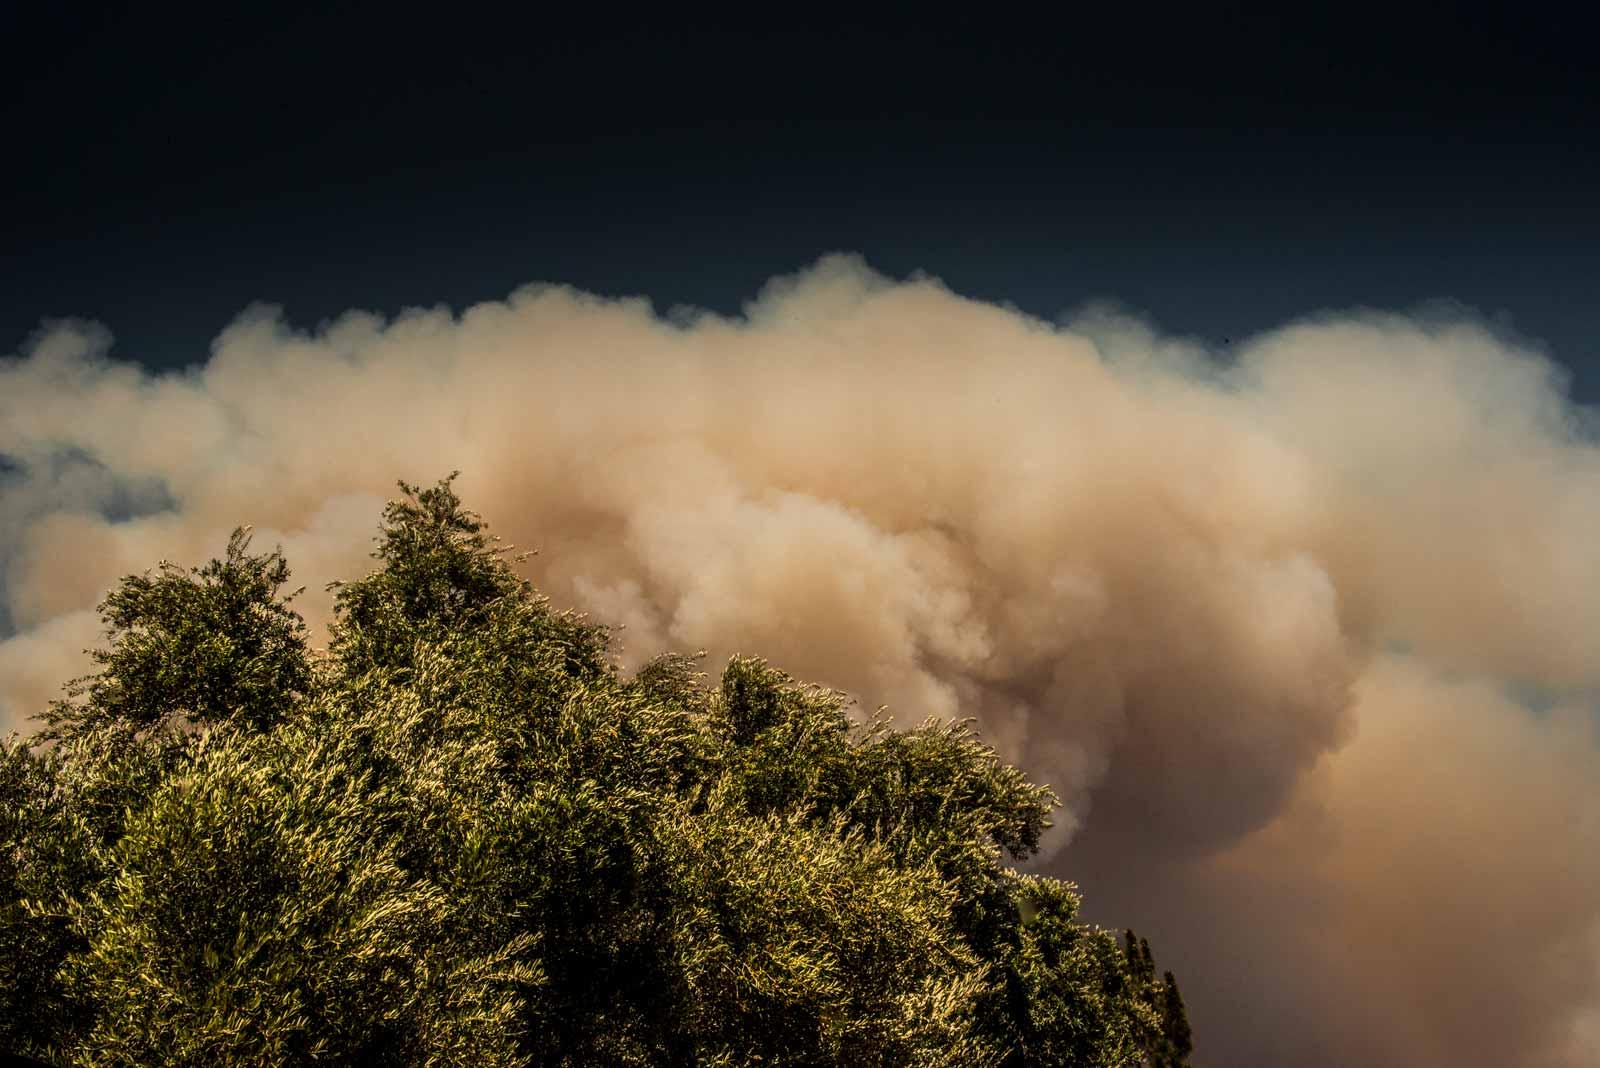 Fire in Monrovia, Tree California, 2016